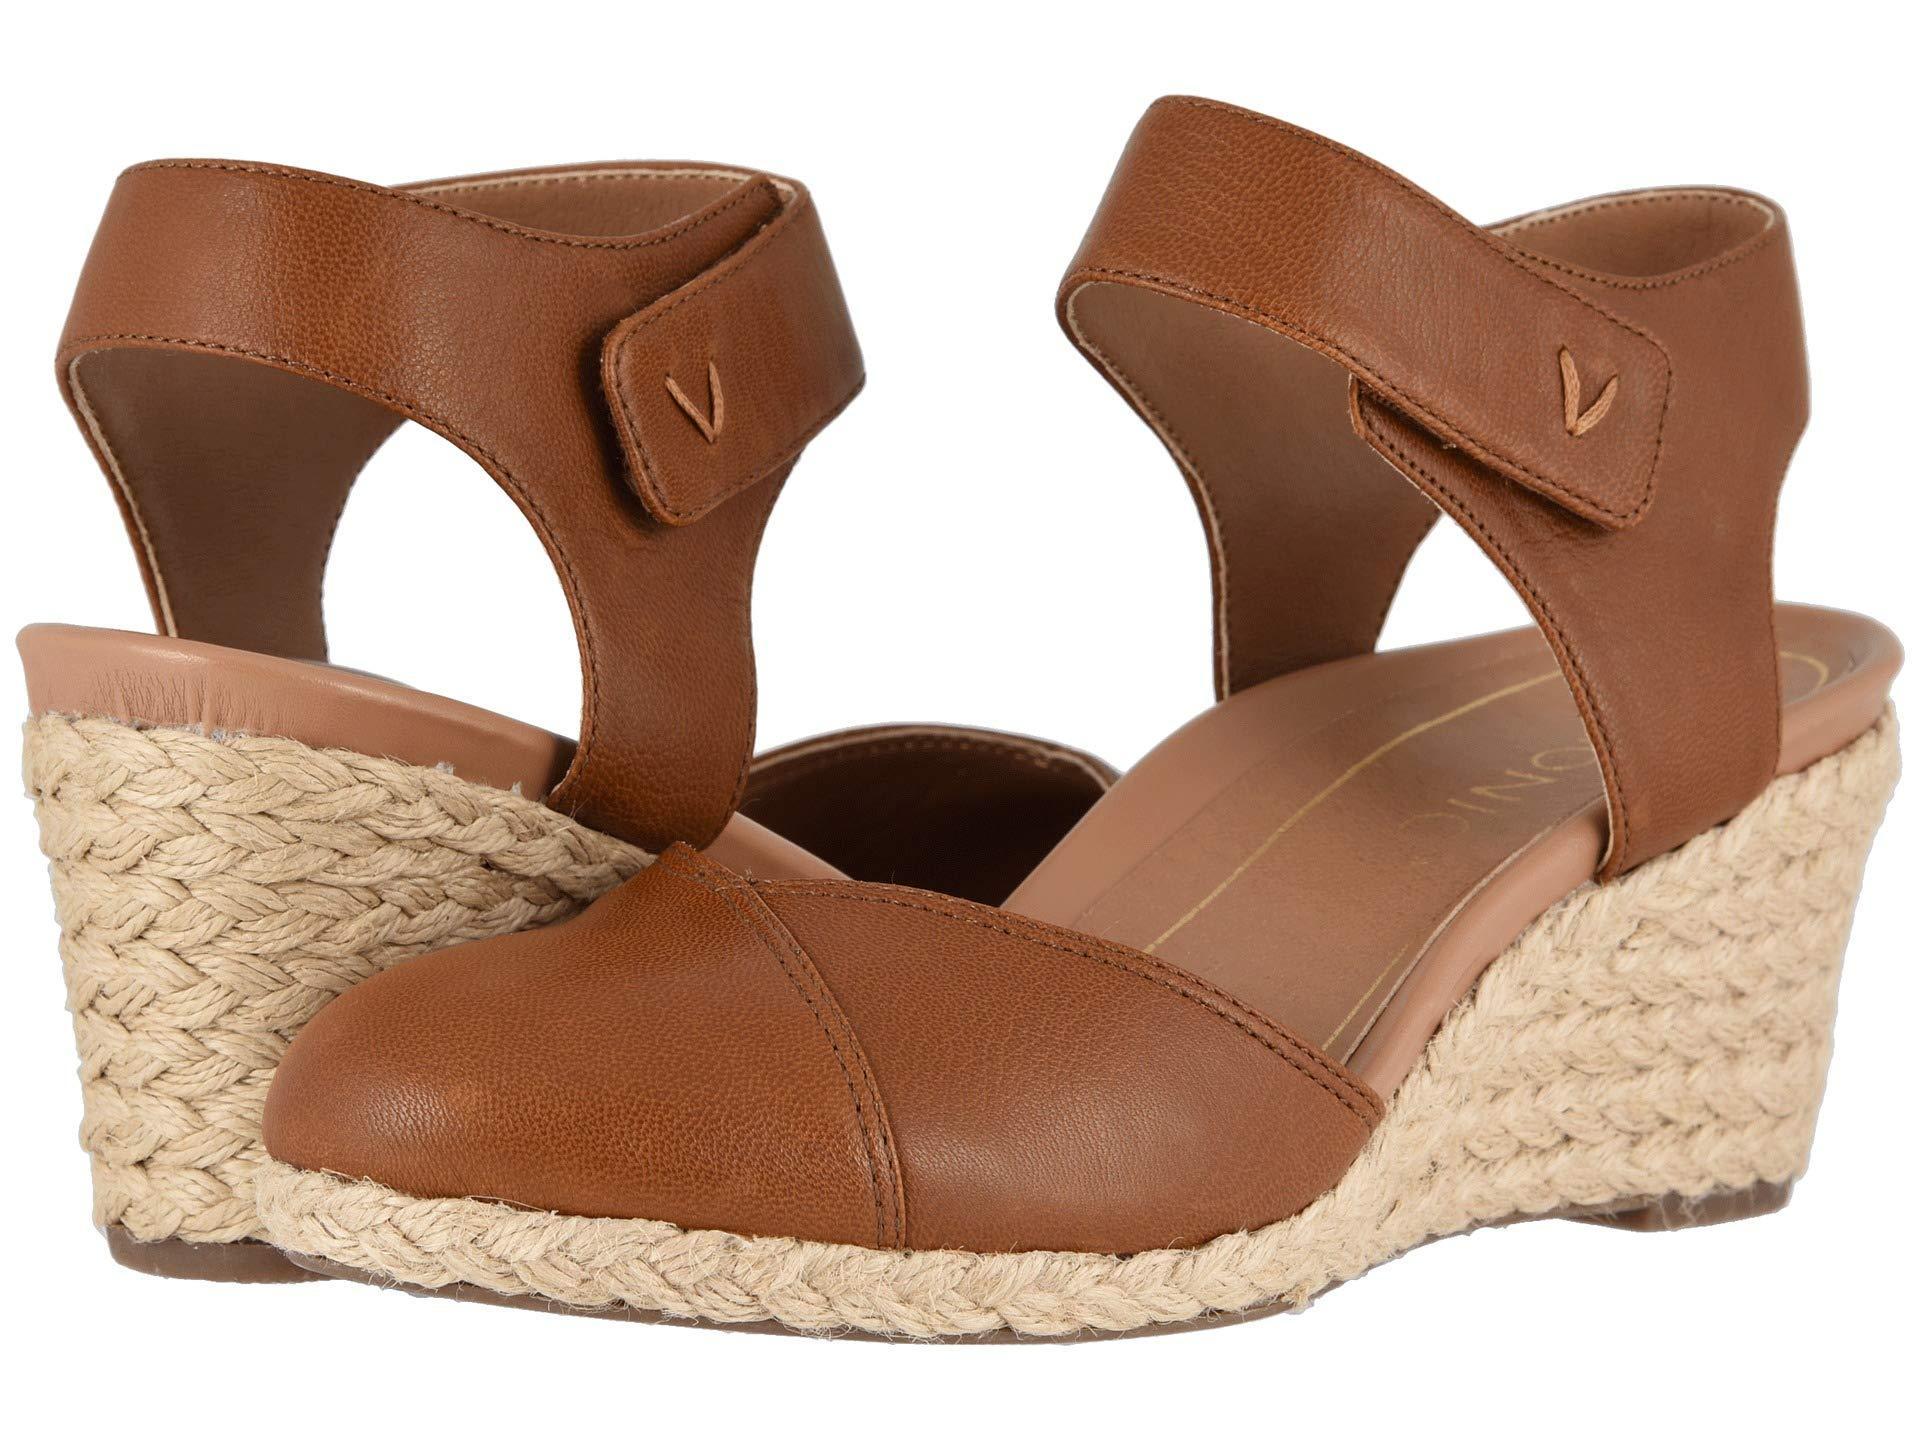 1b5ff07eda Vionic Loika (black) Women's Wedge Shoes in Brown - Lyst